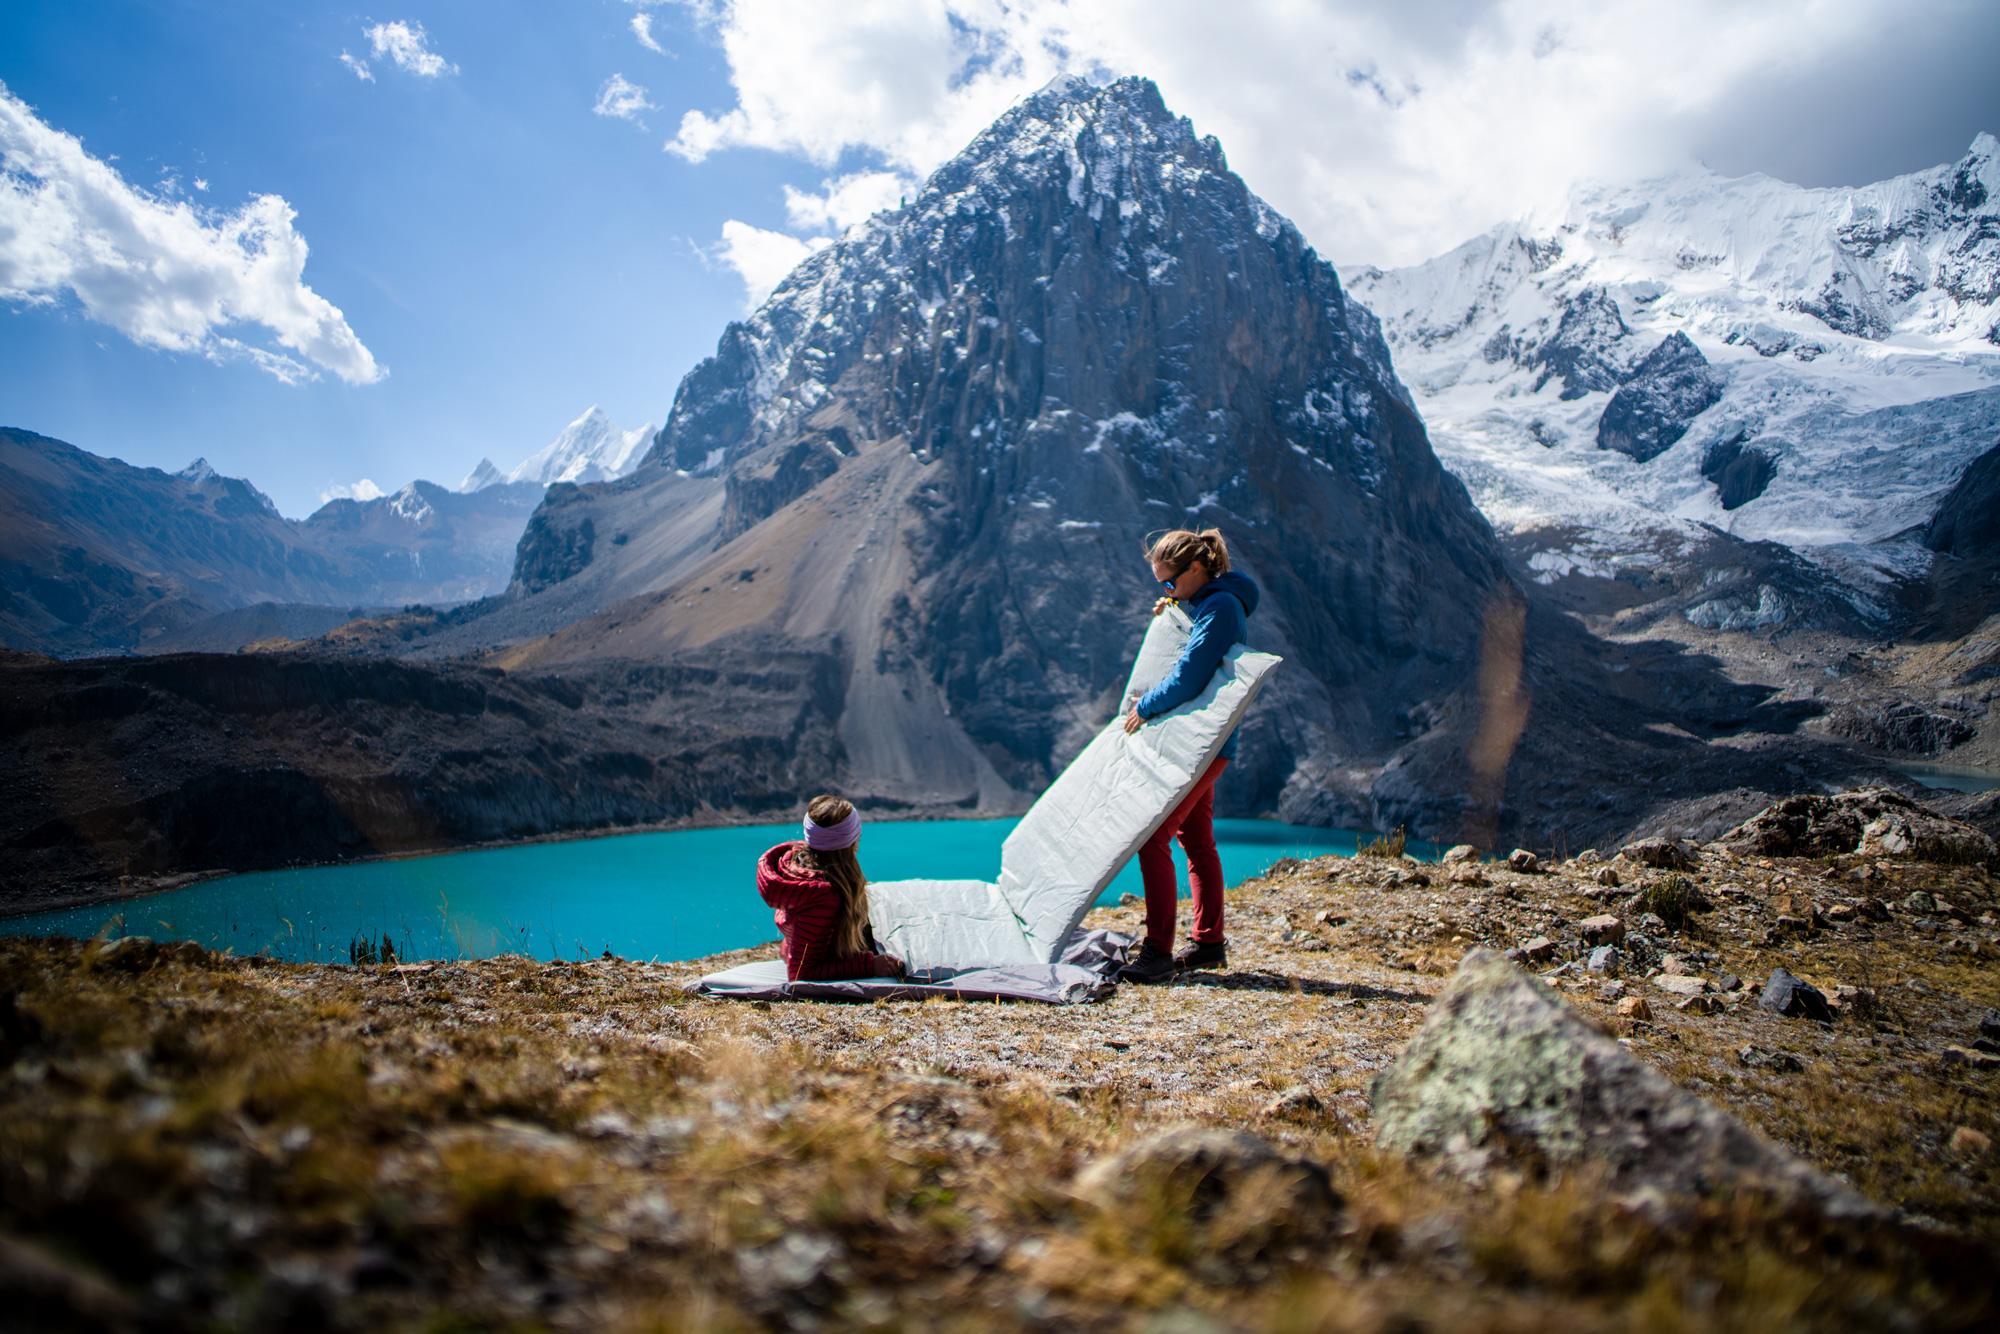 Inflating sleeping pad on backpacking trip